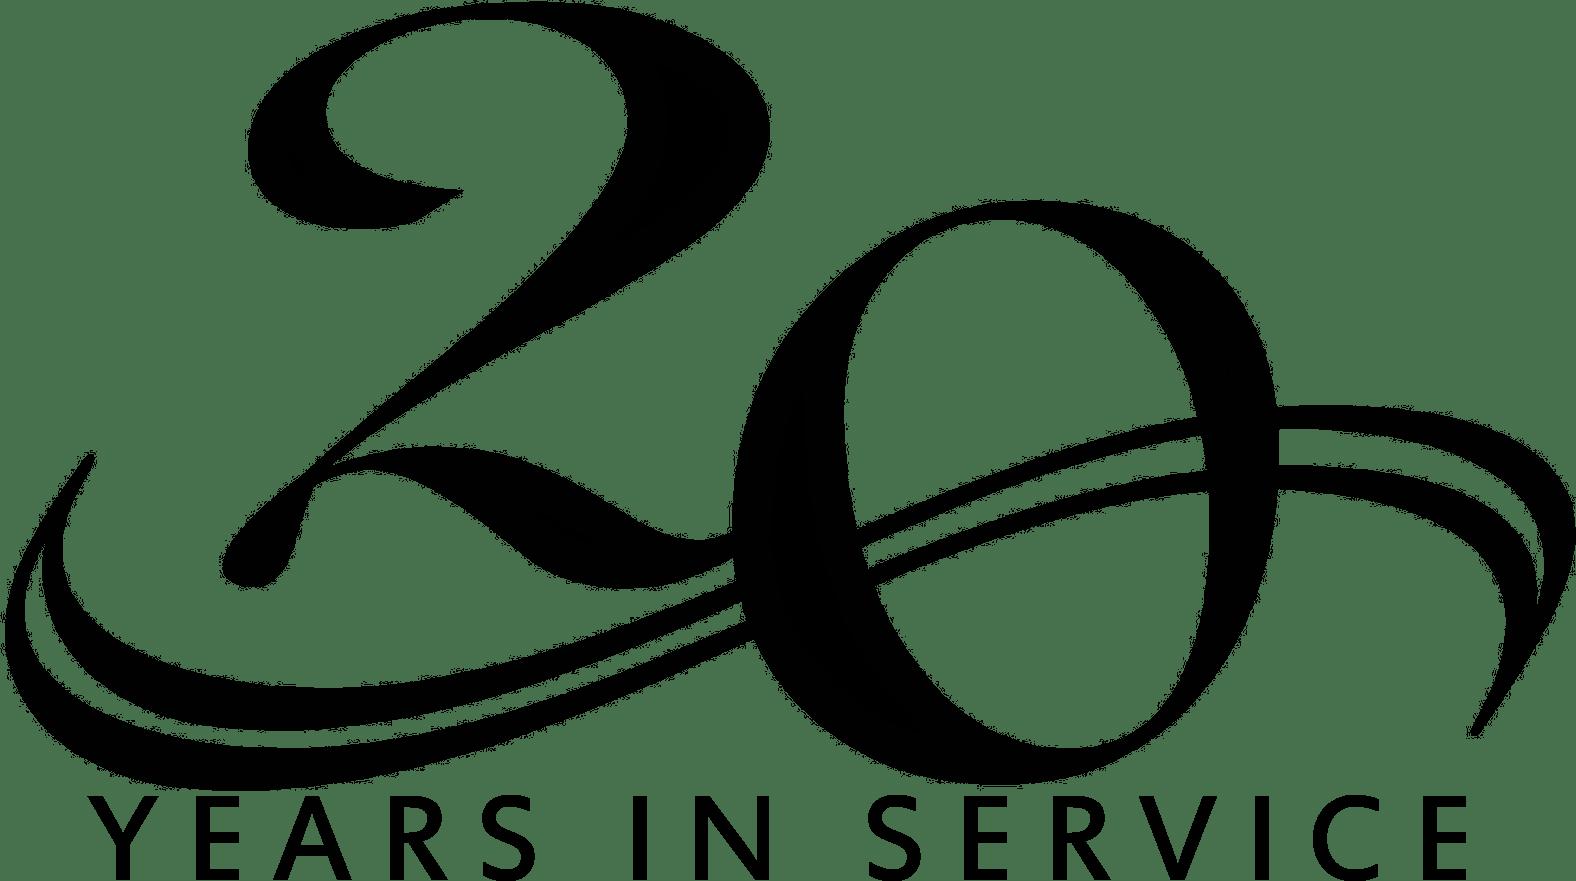 Rpc Services Llc